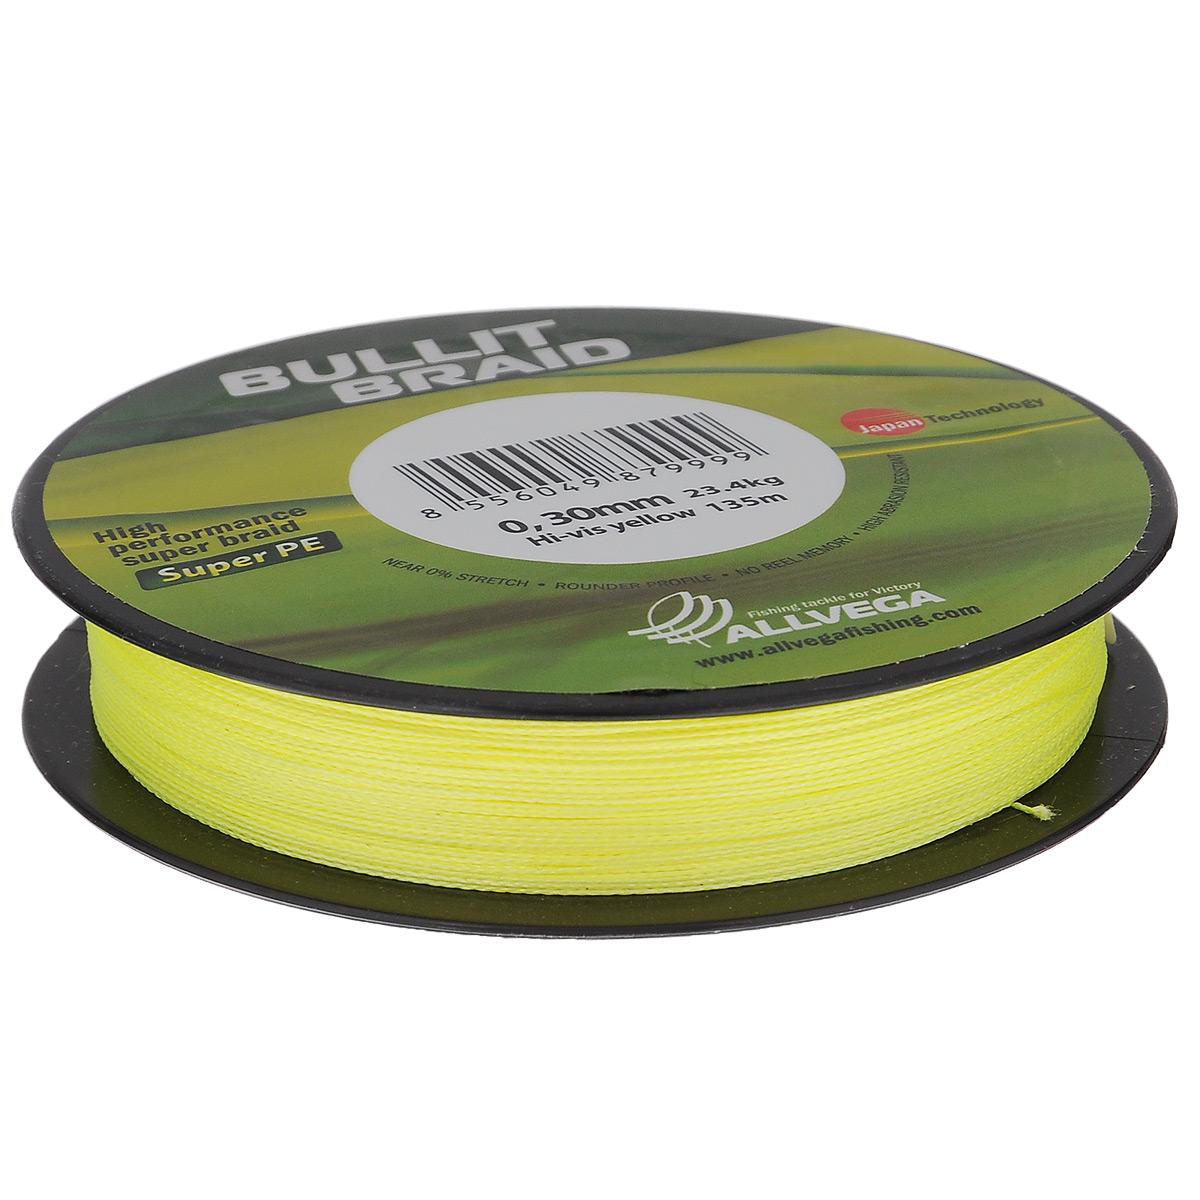 Леска плетеная Allvega Bullit Braid, цвет: ярко-желтый, 135 м, 0,3 мм, 23,4 кг леска allvega fluorocarbon hybrid цвет прозрачный 30 м 0 2 мм 4 74 кг